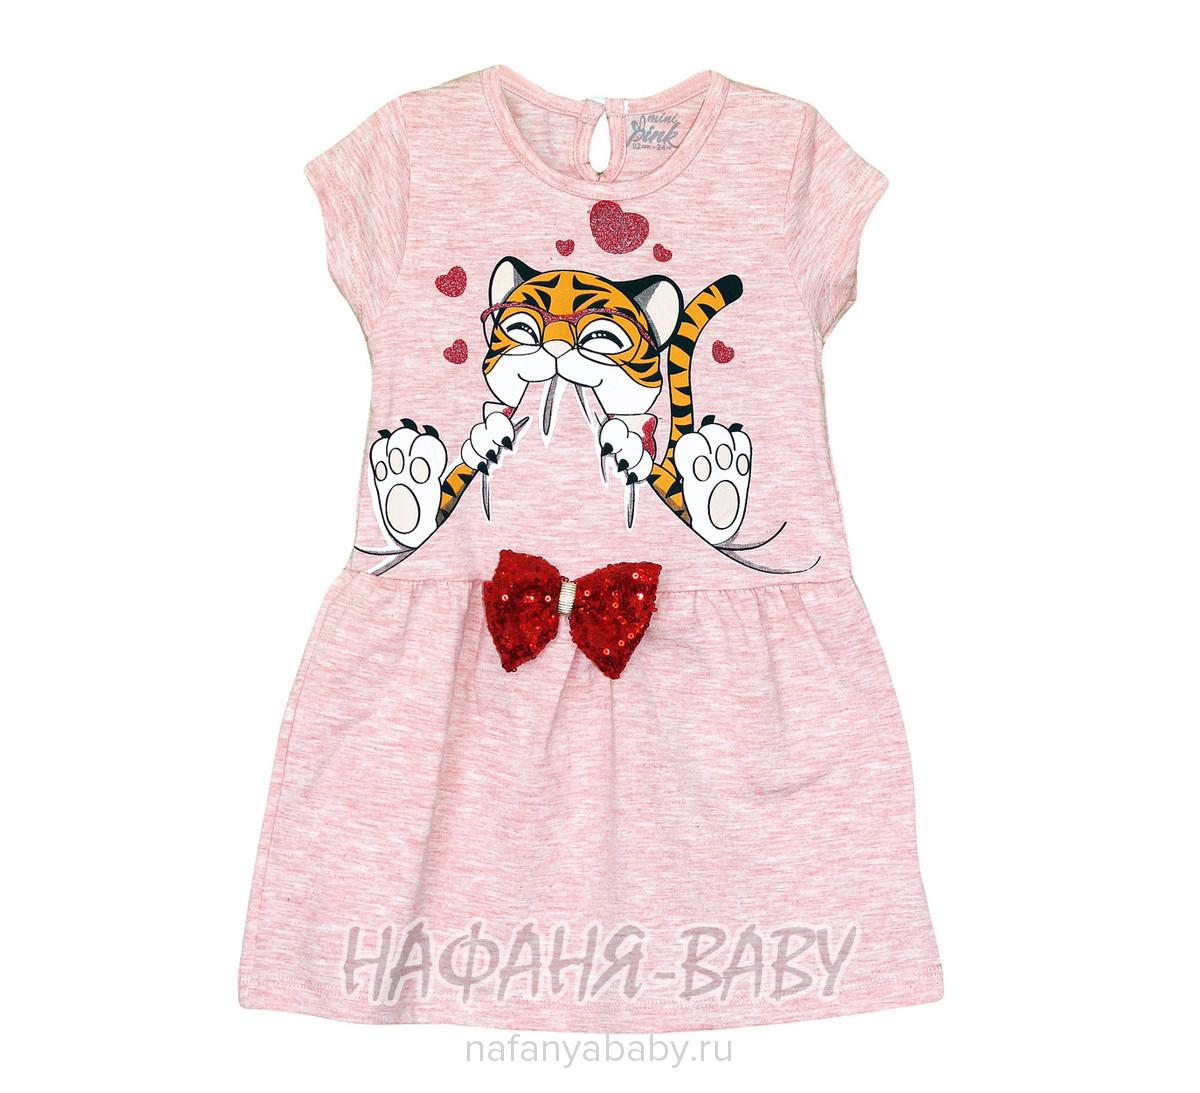 Платье с тигренком PINK арт: 1135, 1-4 года, 0-12 мес, цвет розовый меланж, оптом Турция